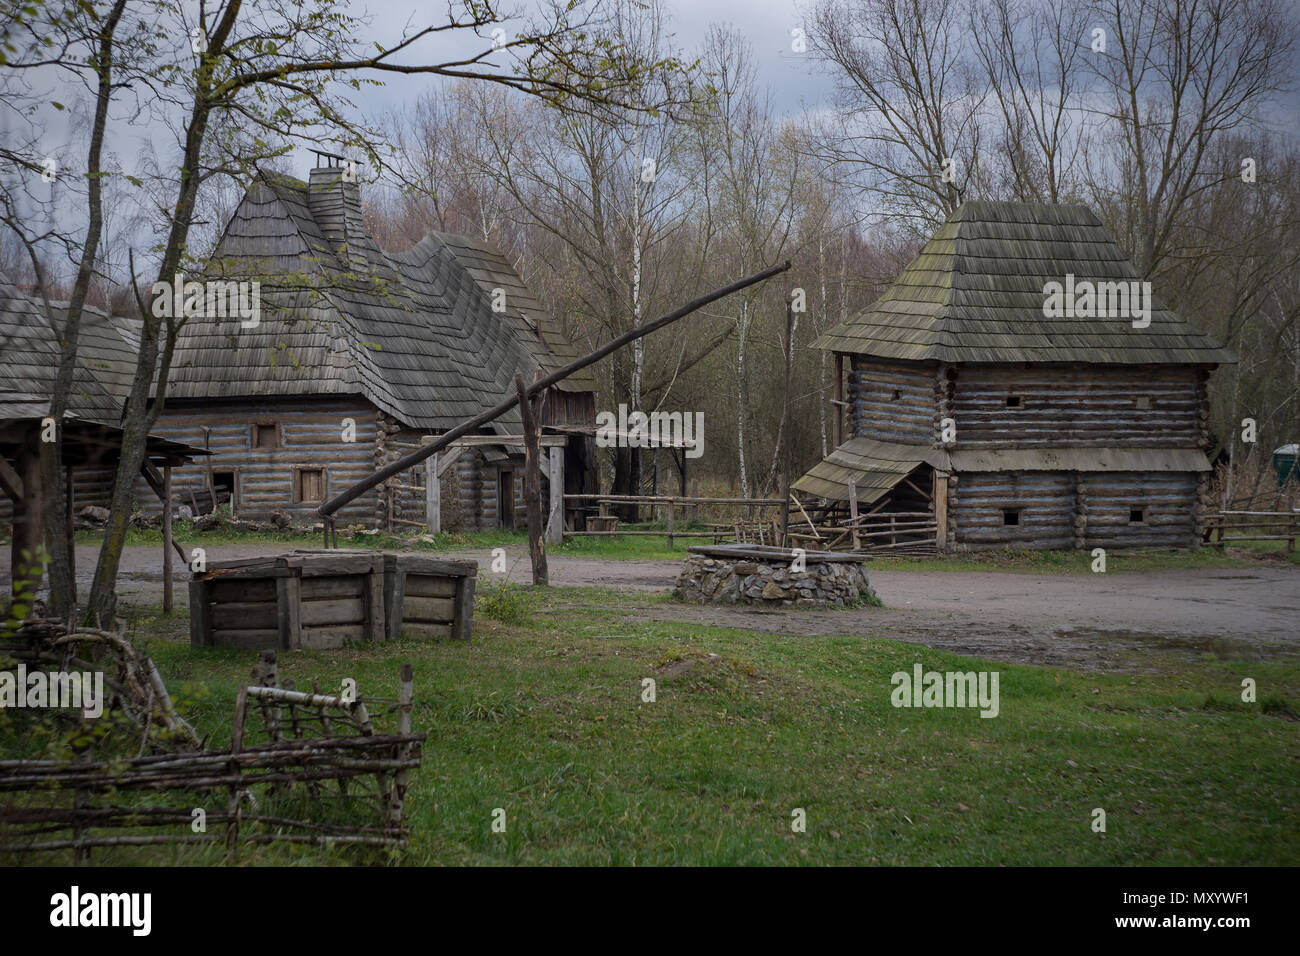 Abandoned Medieval Village, Prague, Czech Republic. - Stock Image